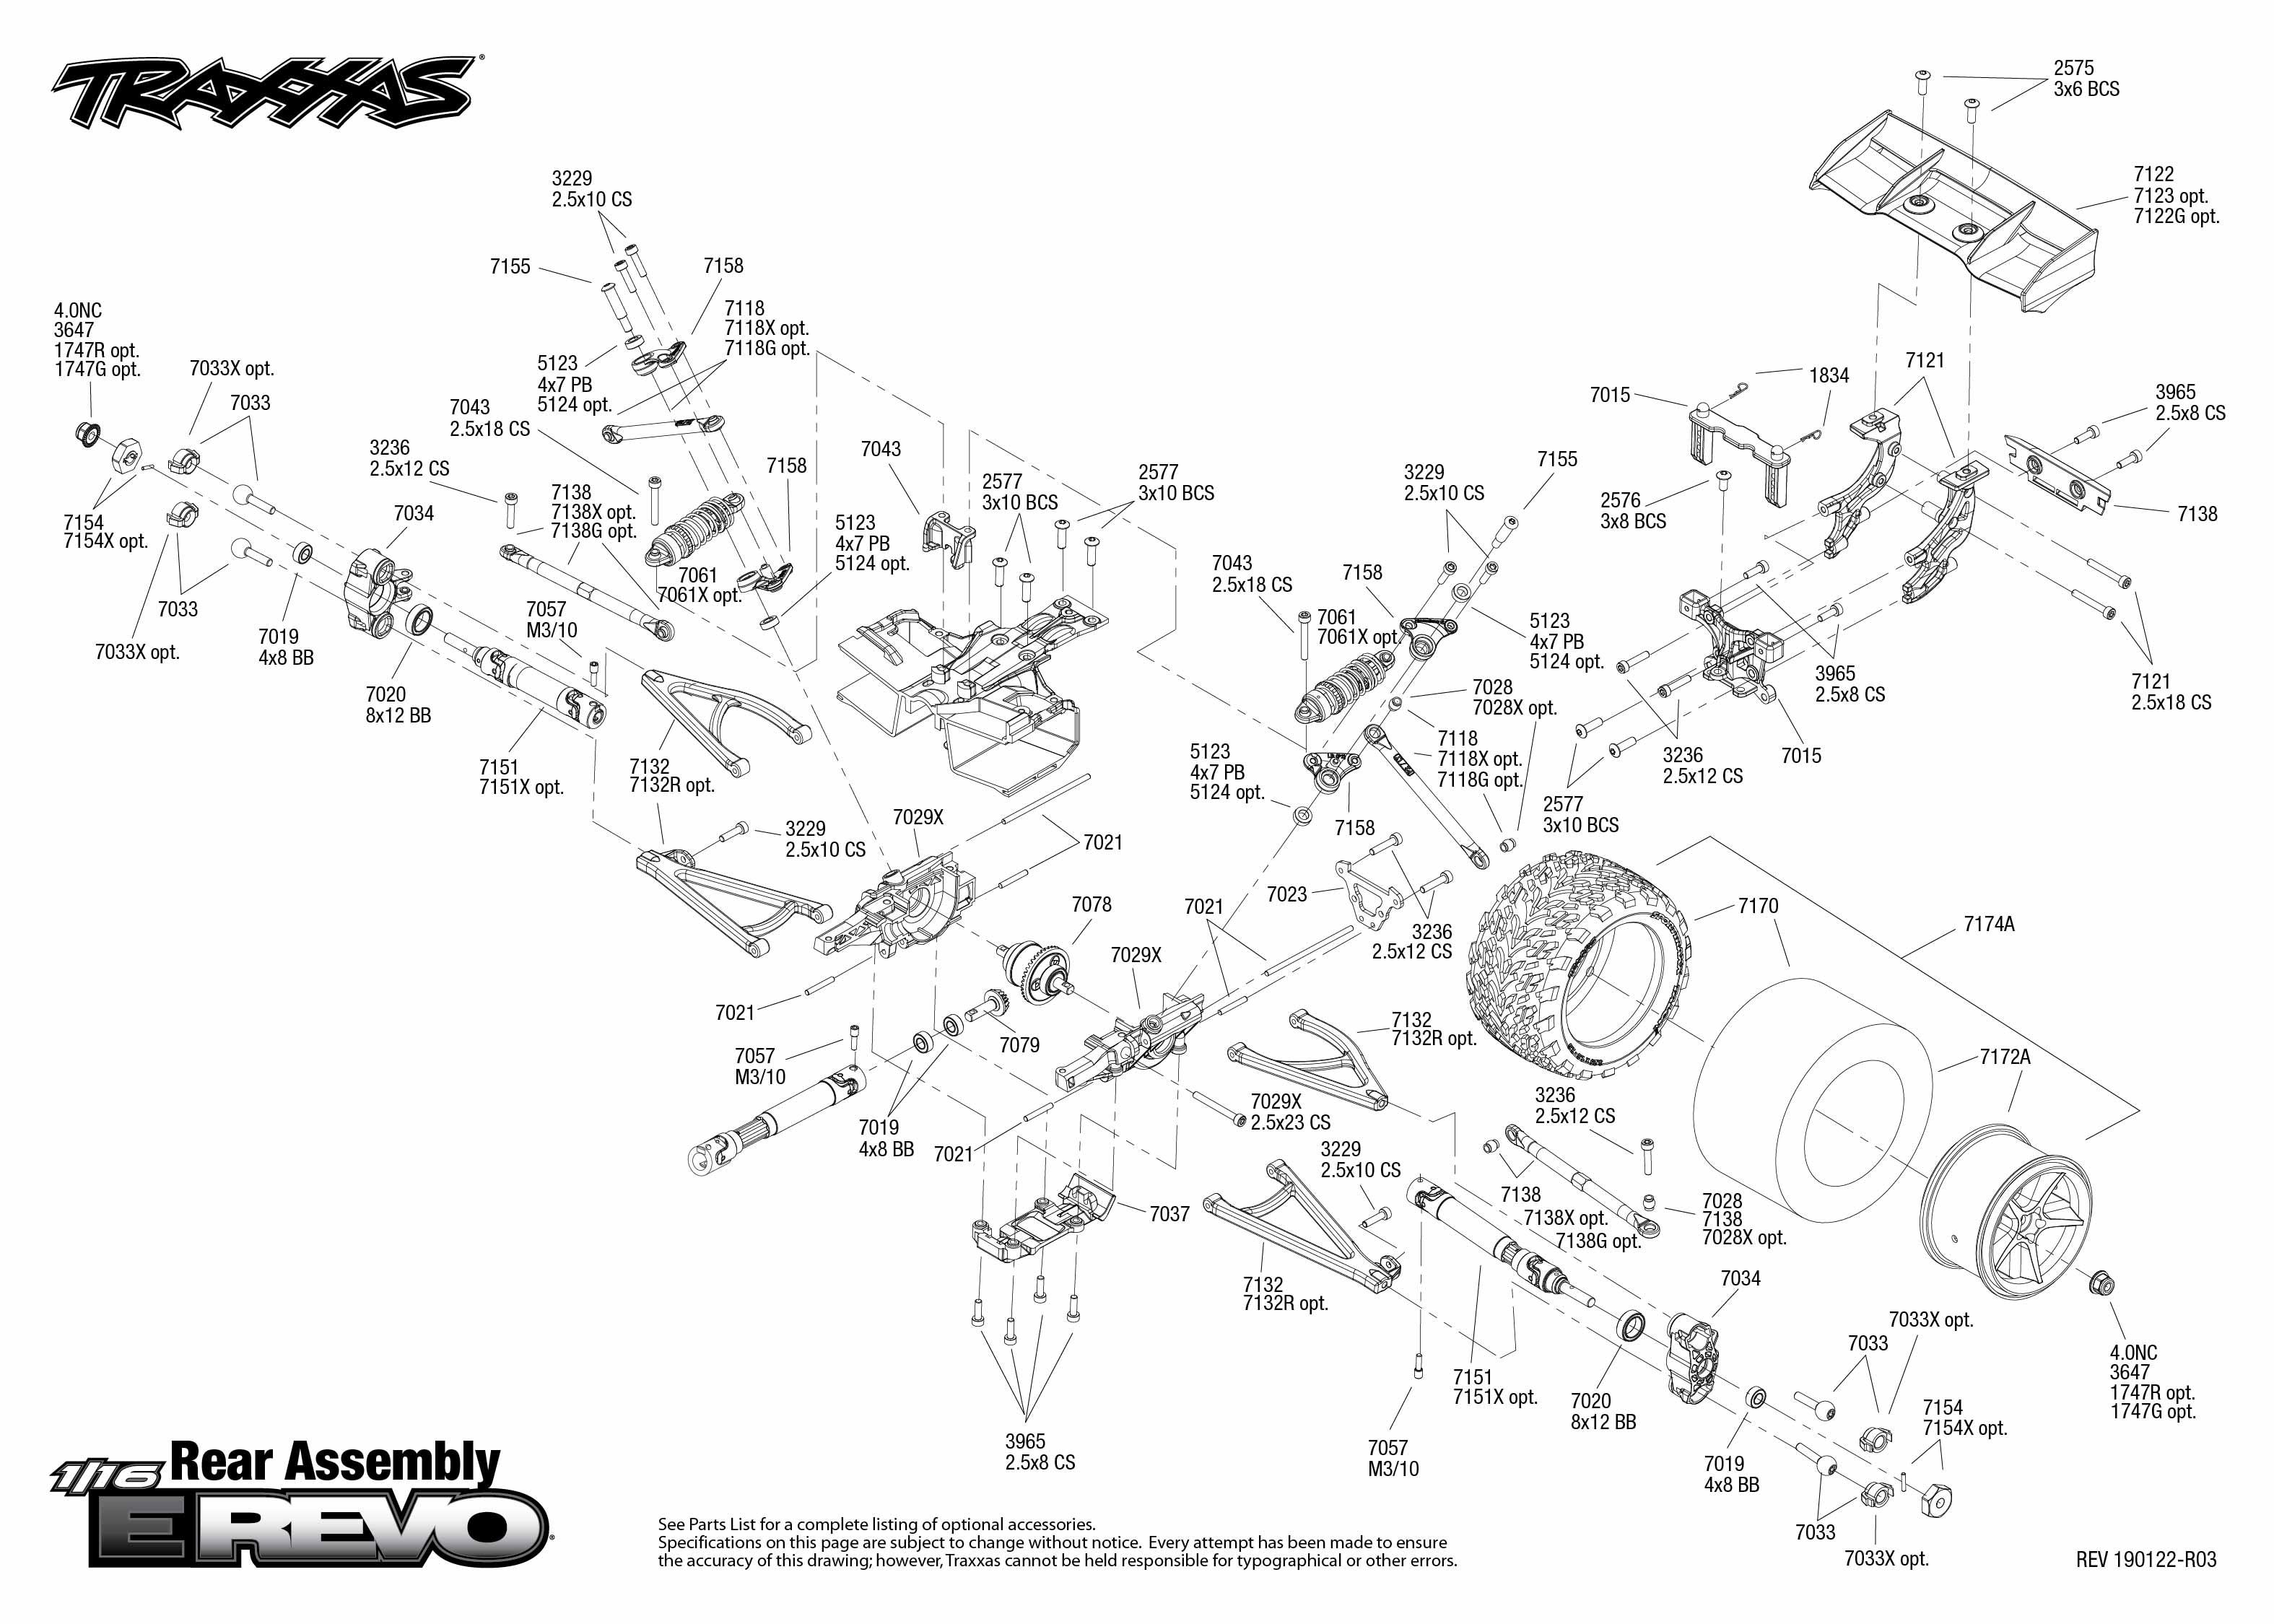 Traxxas E-Revo 1/16 4WD Monster Truck with TQ 2.4GHz radio